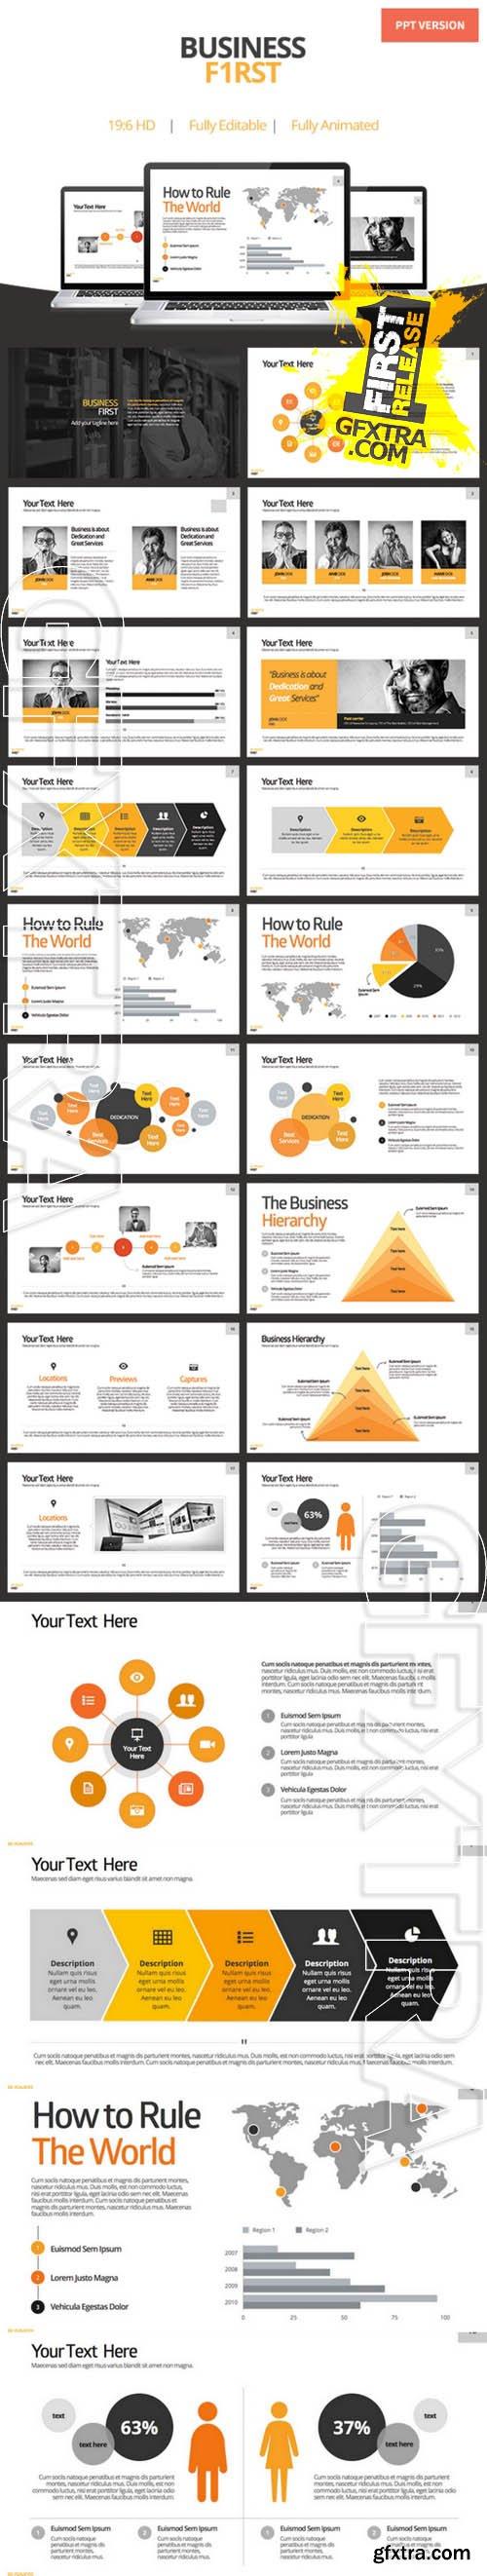 Business First - Powerpoint Template - Creativemarket 85622